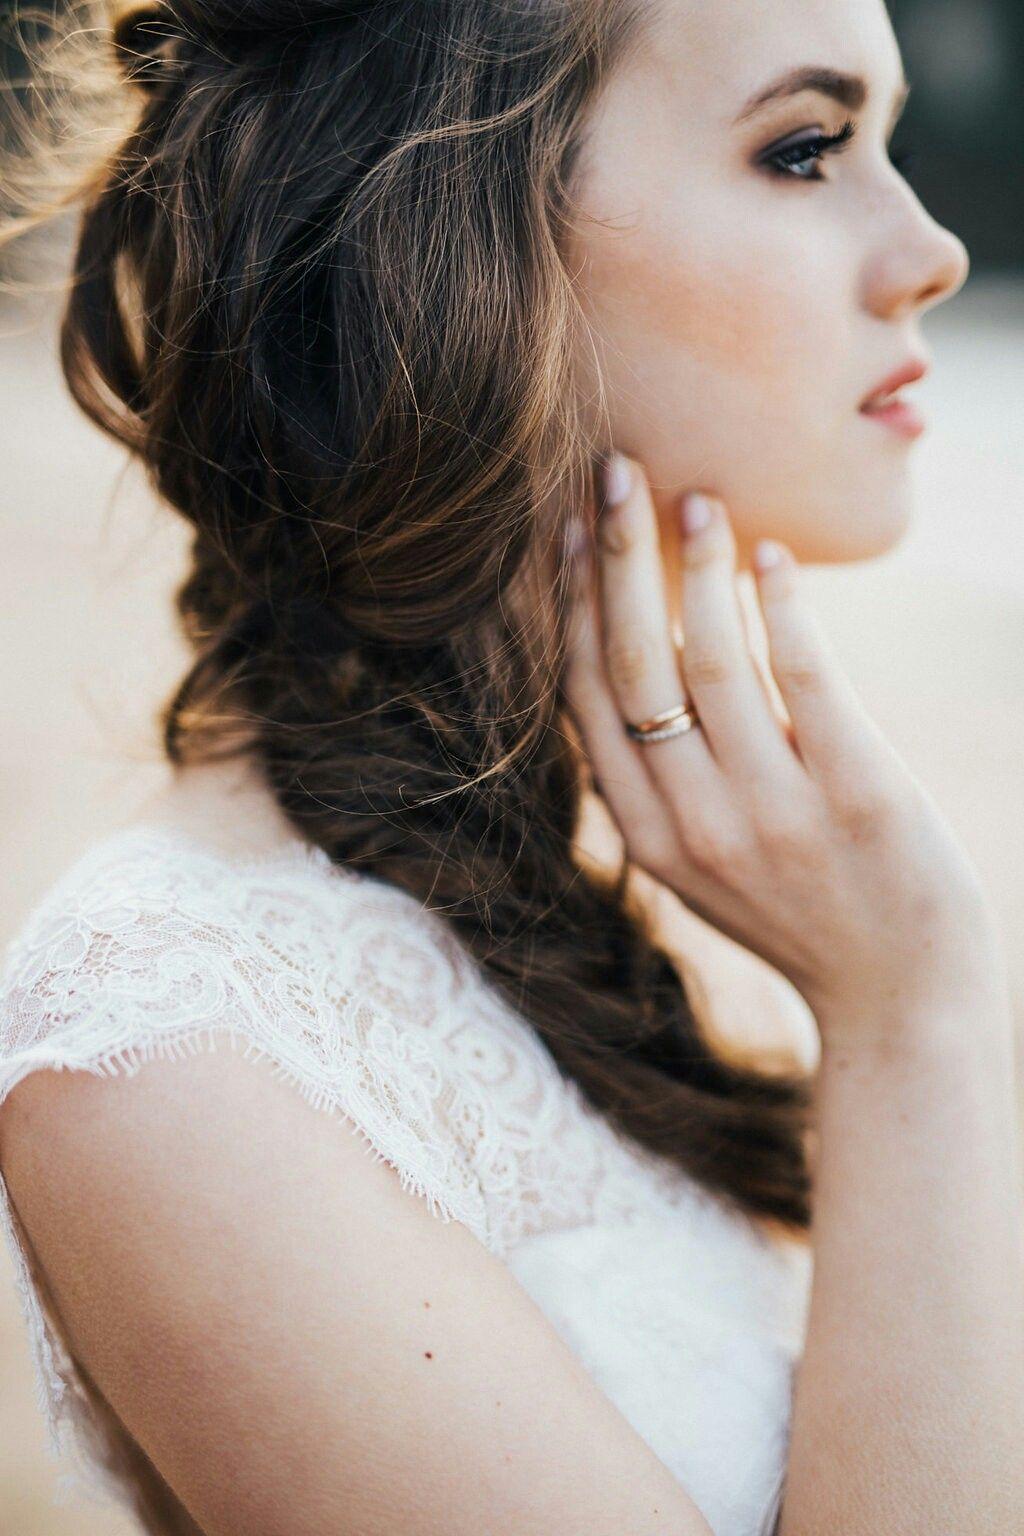 #bride #bridal #bridalmakeup #gelin #gelinmakyaji #gelinsaci #gelinlik #bridalhair #bridemakeup #makeupartist #makyaj #makeupguru #fidankandemir